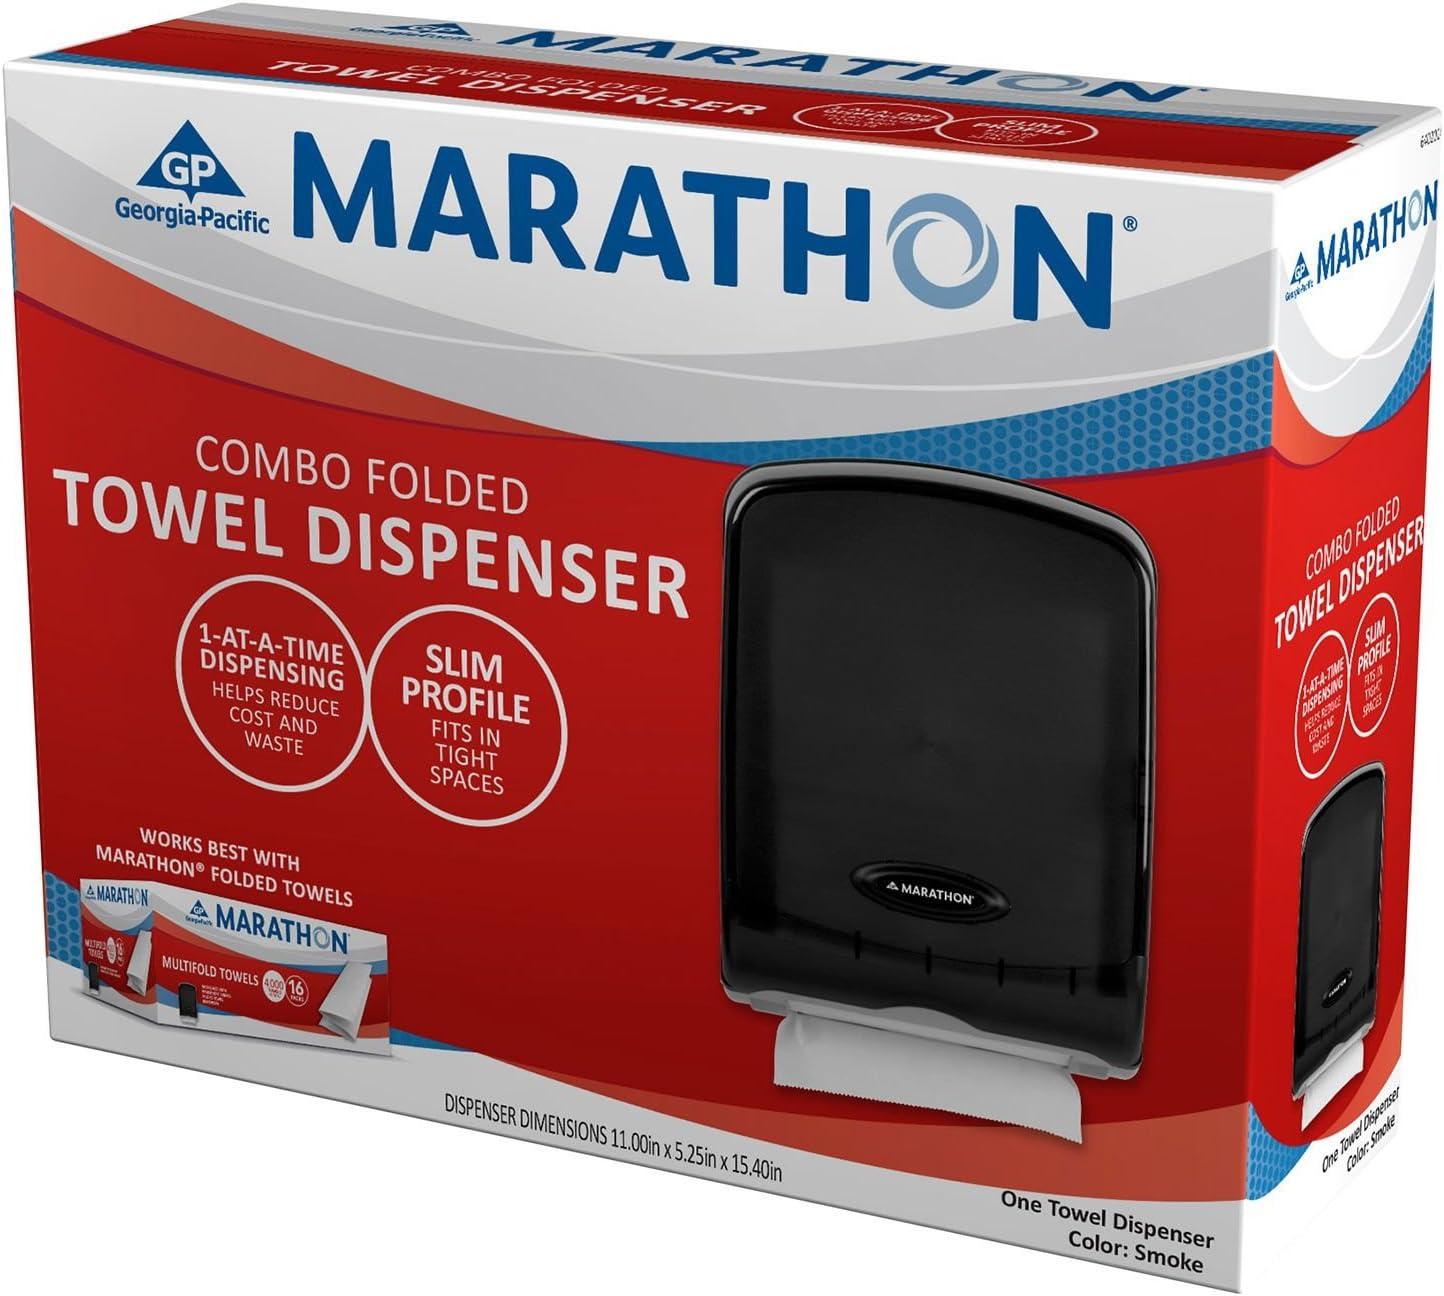 Marathon Combo Folded Towel Dispenser 313 Towel Capacity